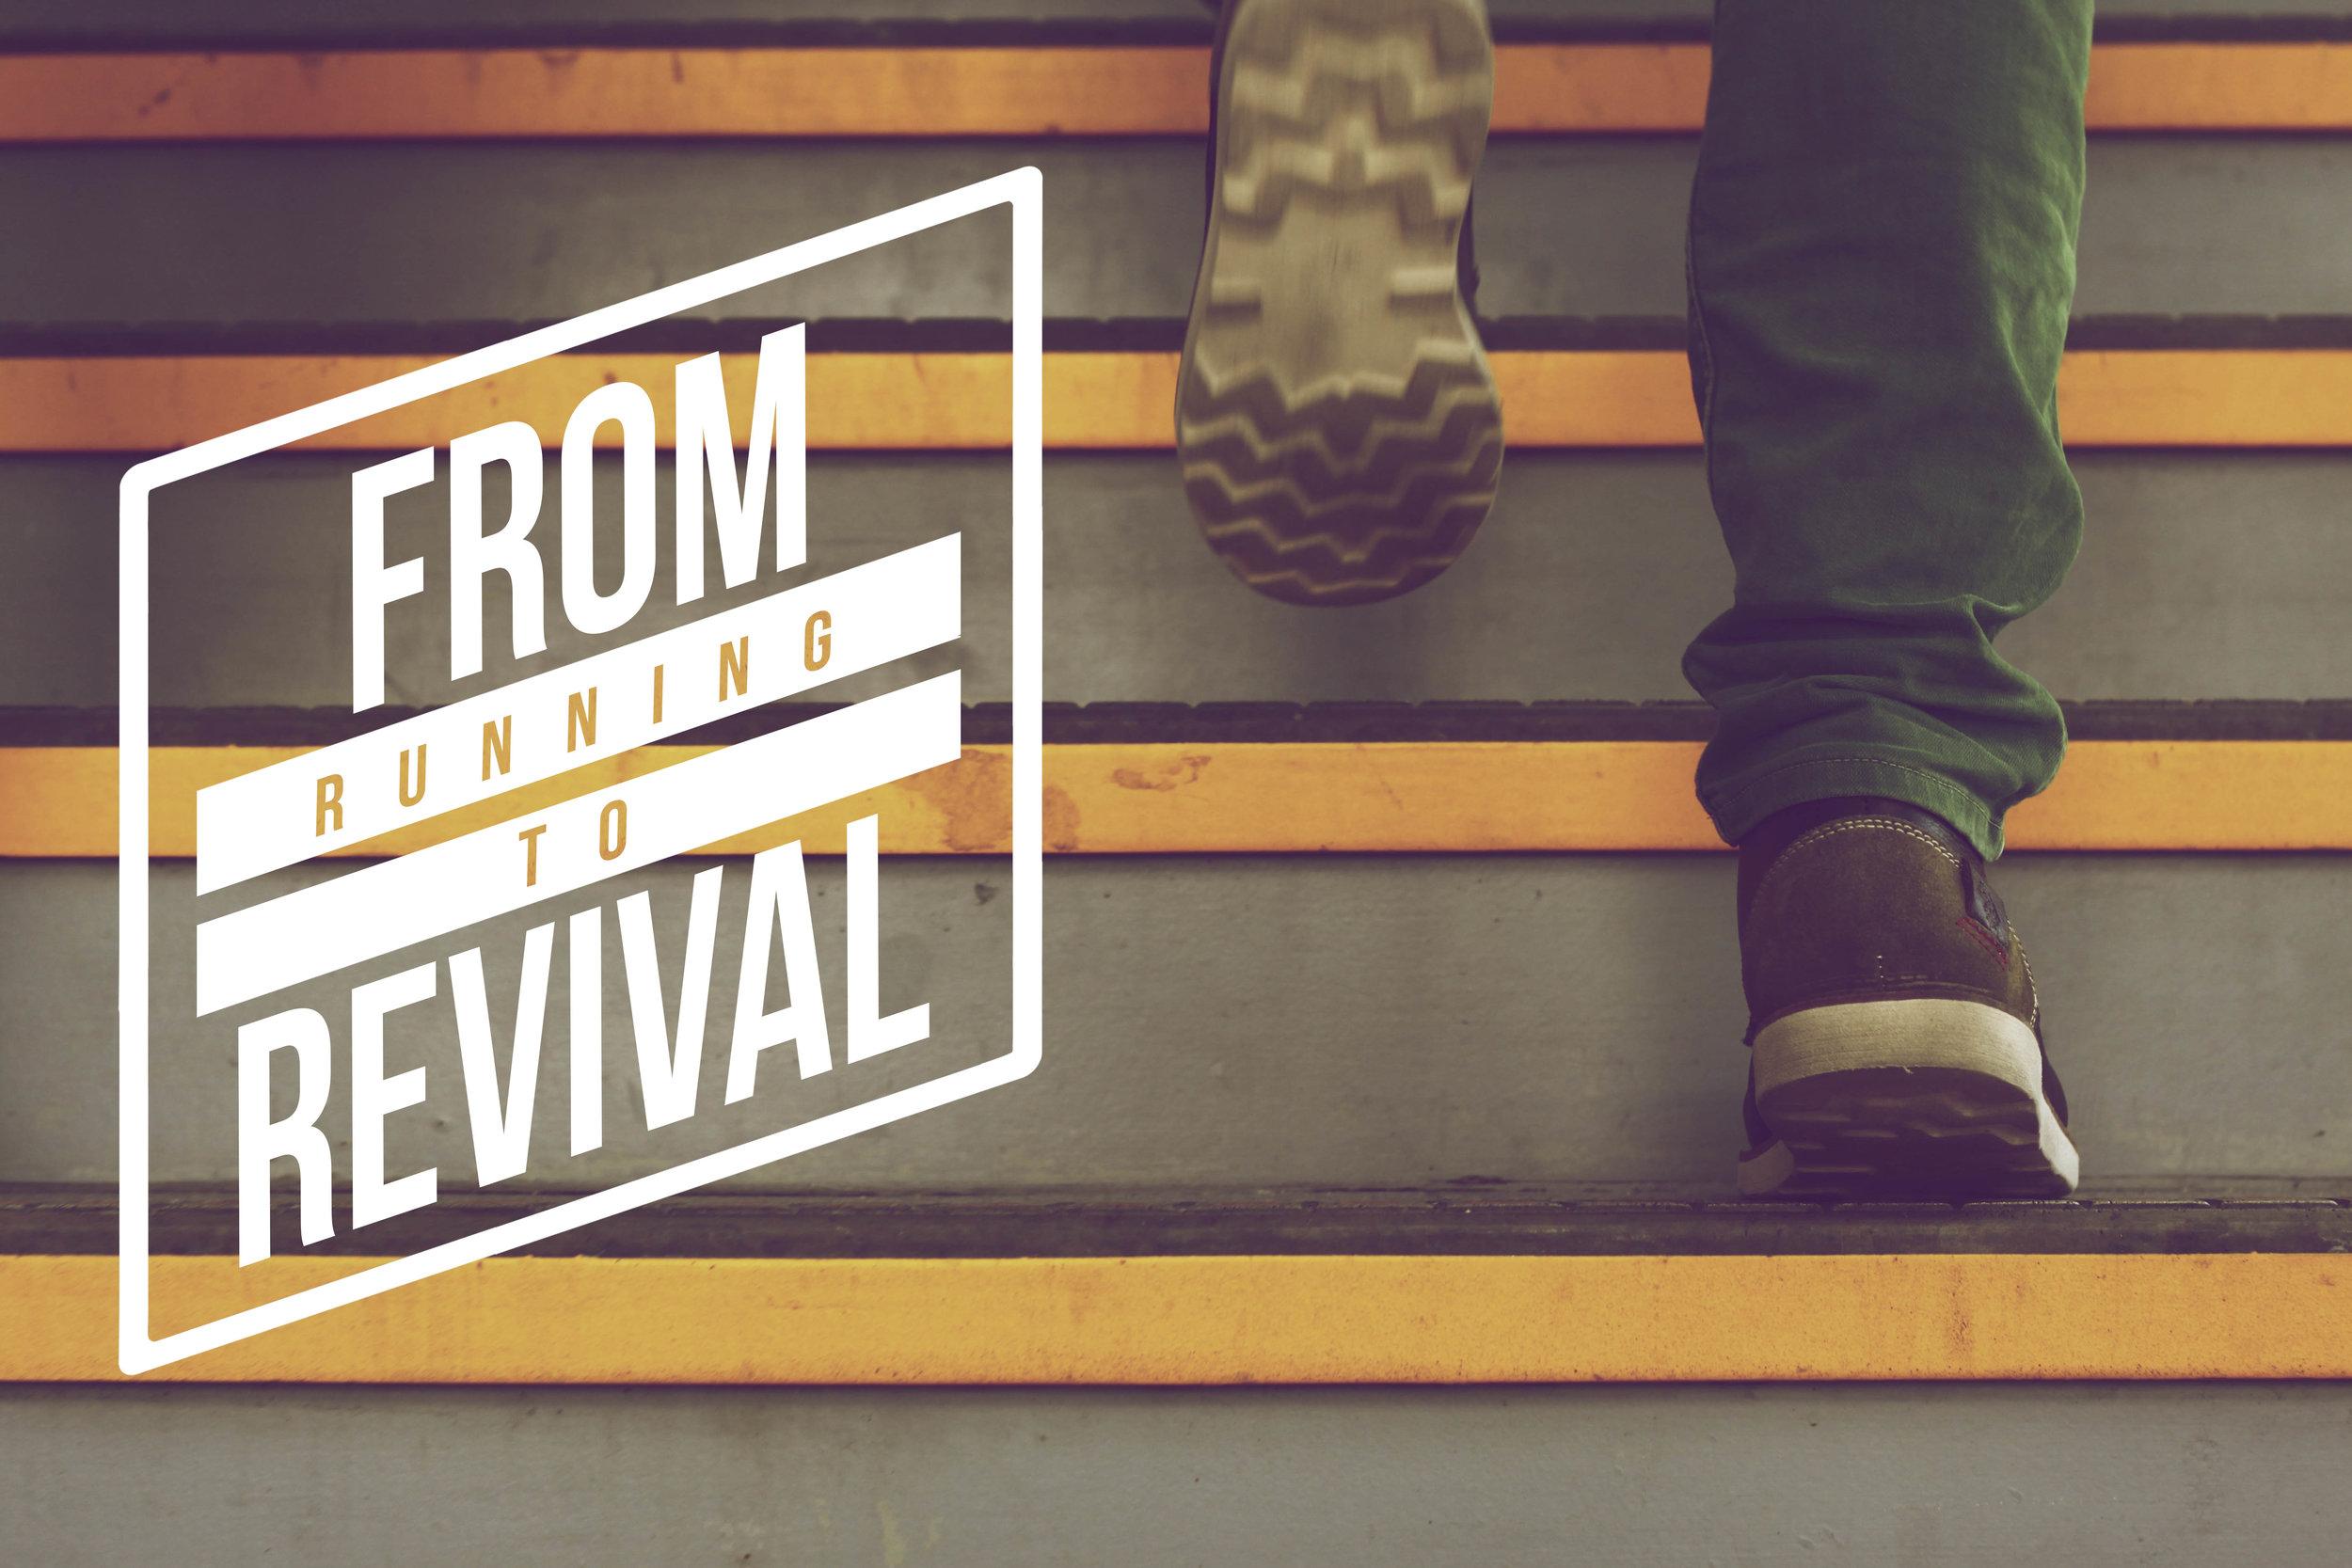 From-Running-to-Revival-Sermon-Series-Idea.jpg